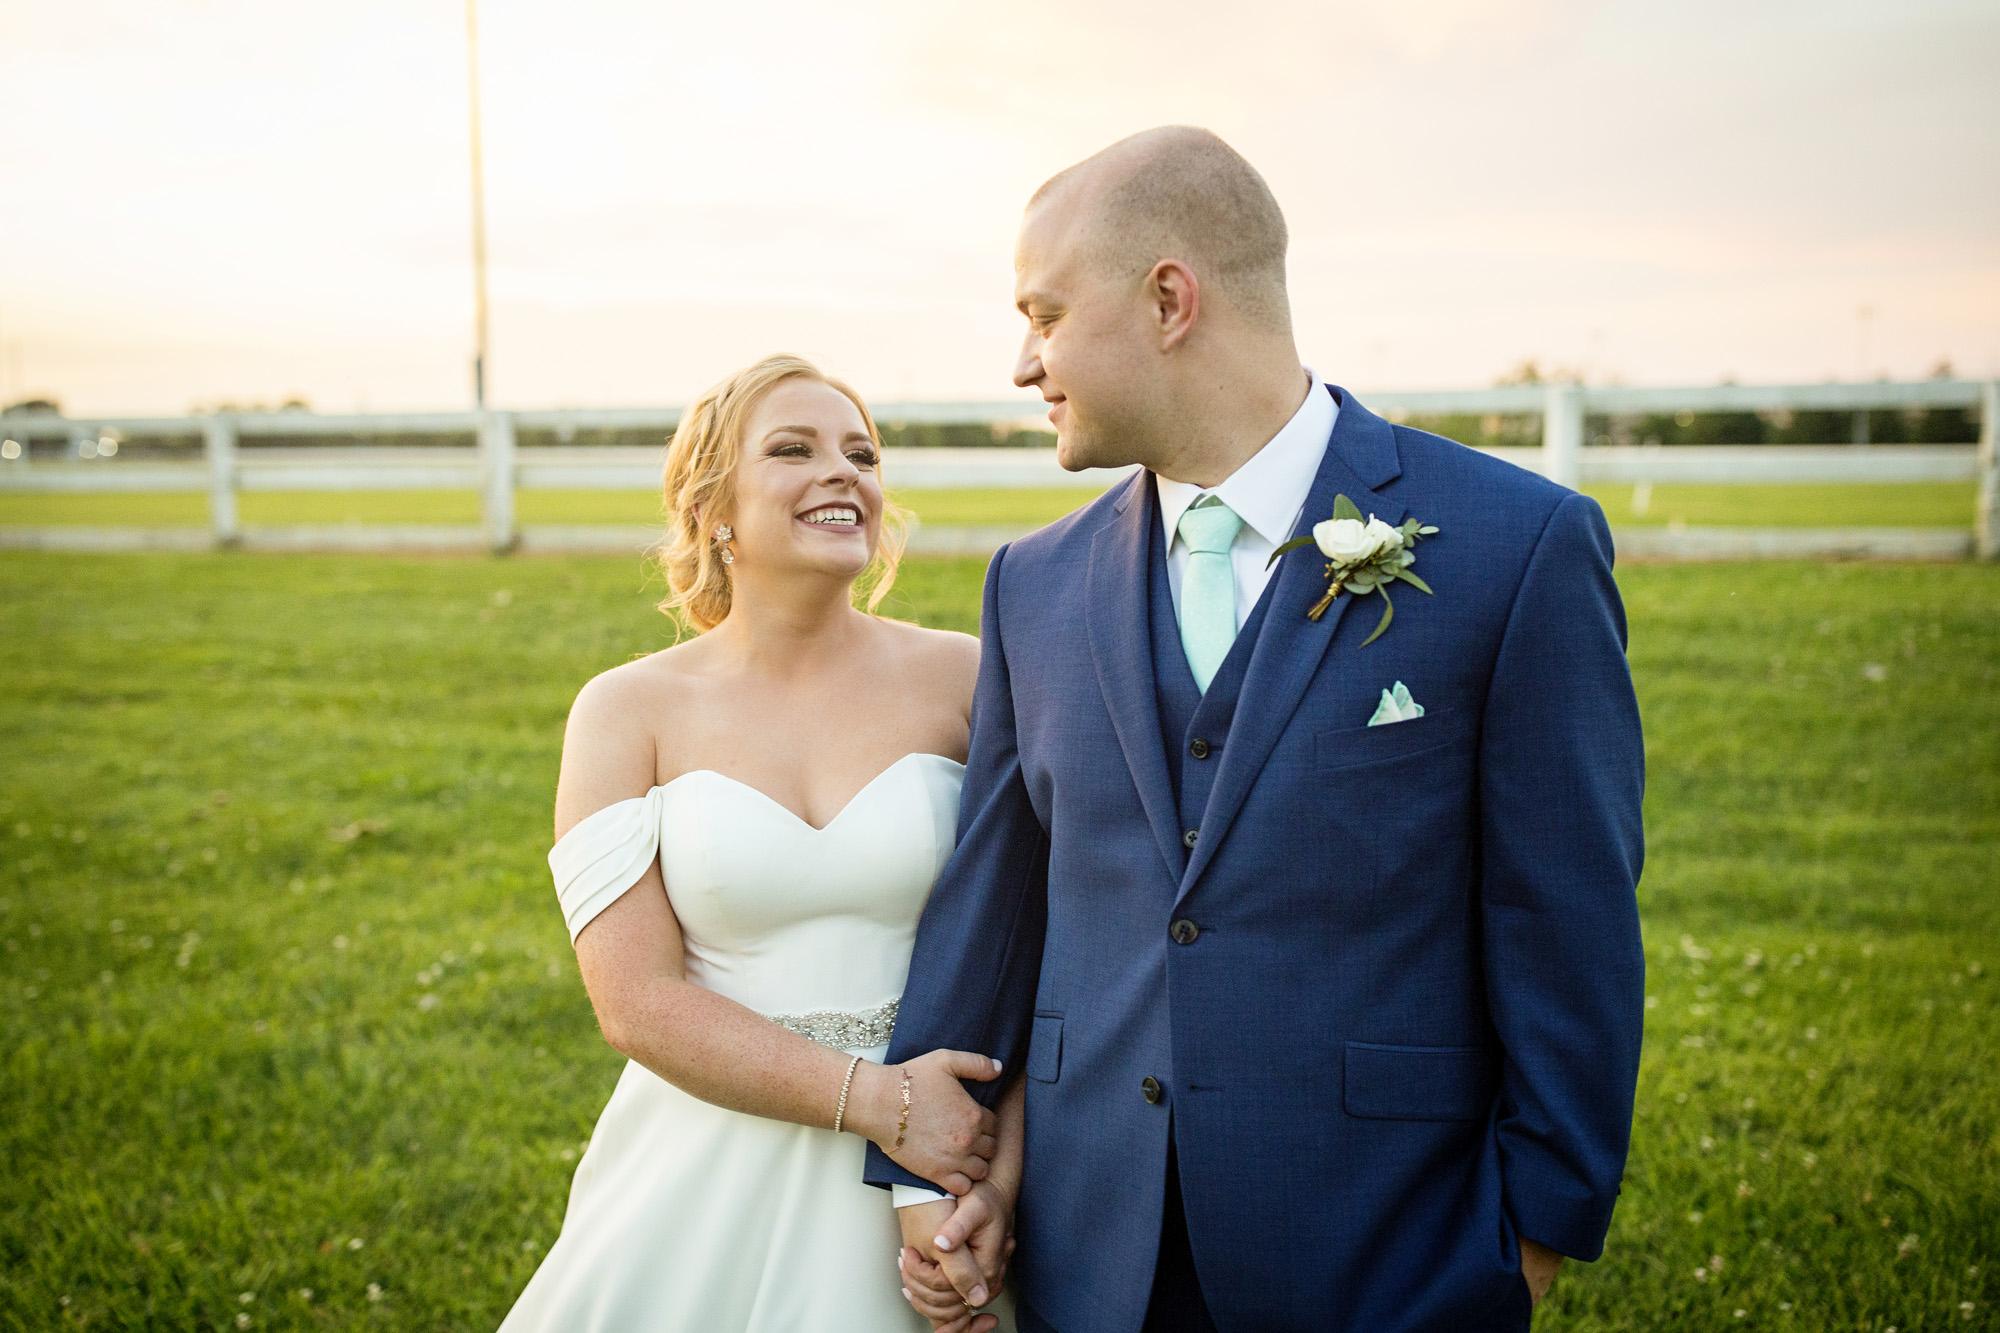 Seriously_Sabrina_Photography_Lexington_Kentucky_Pax_Christi_Round_Barn_Wedding_Beath_78.jpg